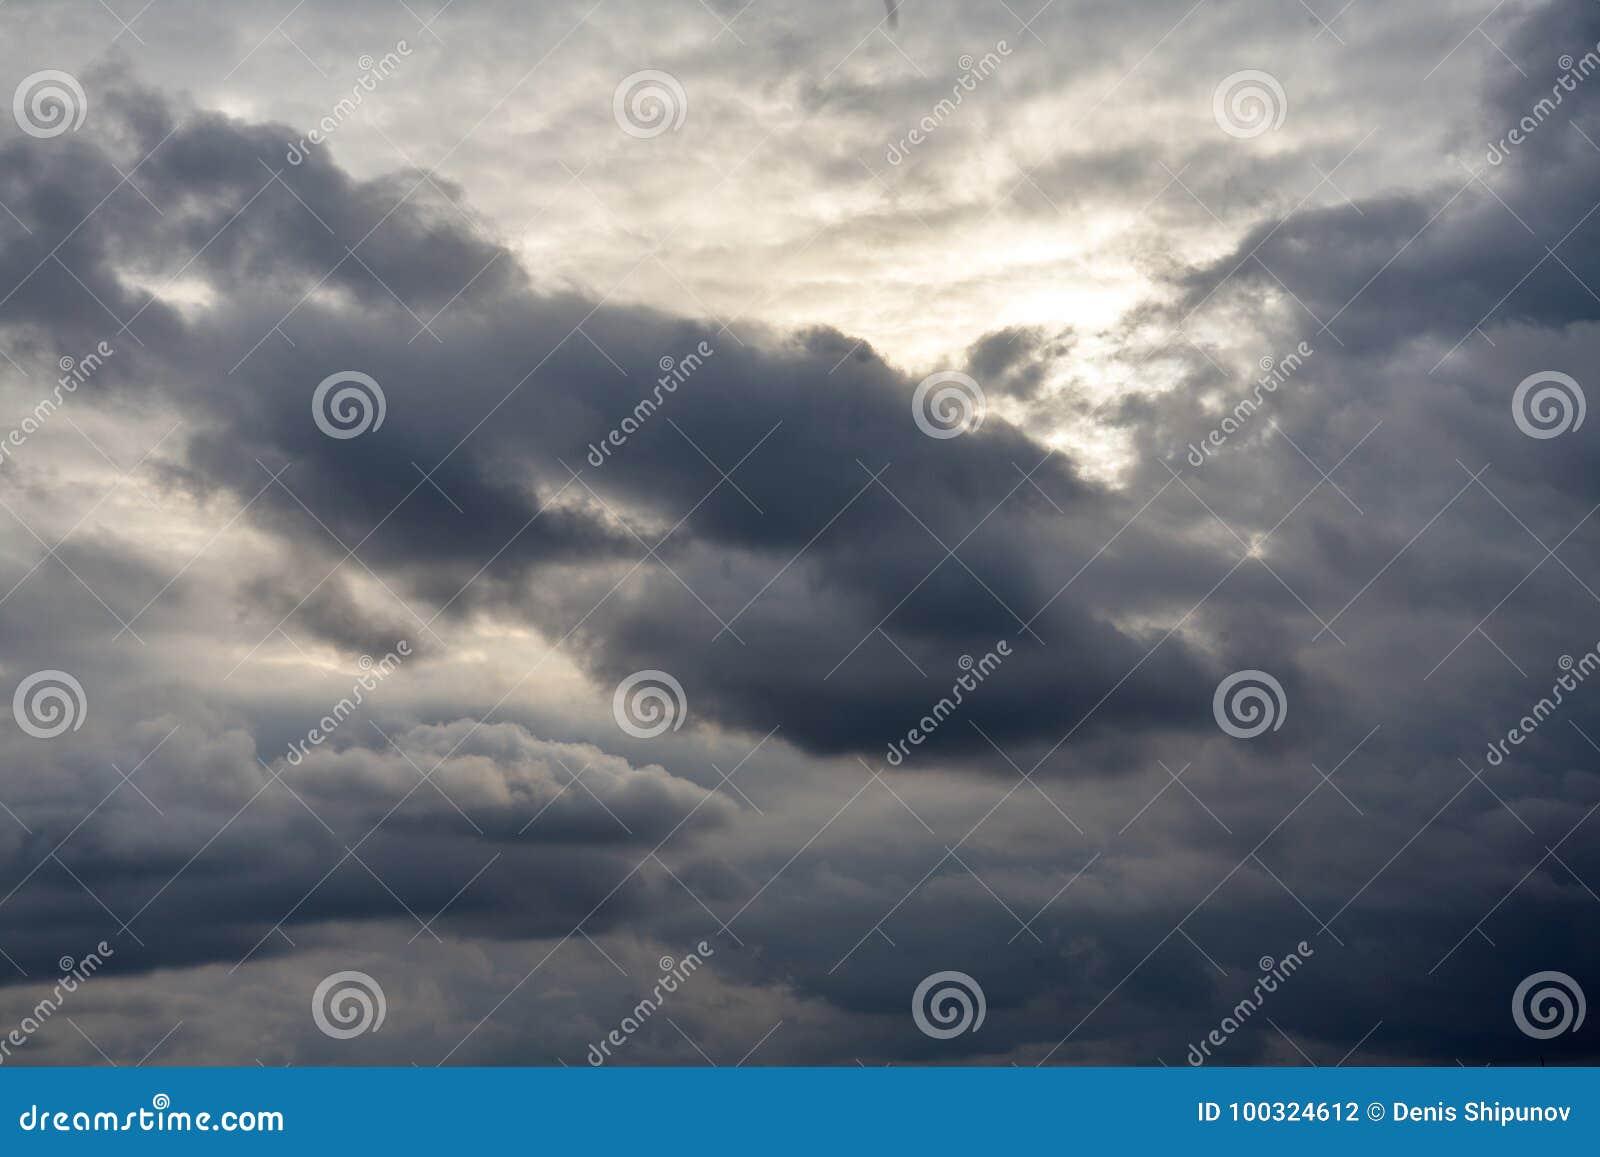 Dark gray dramatic sky